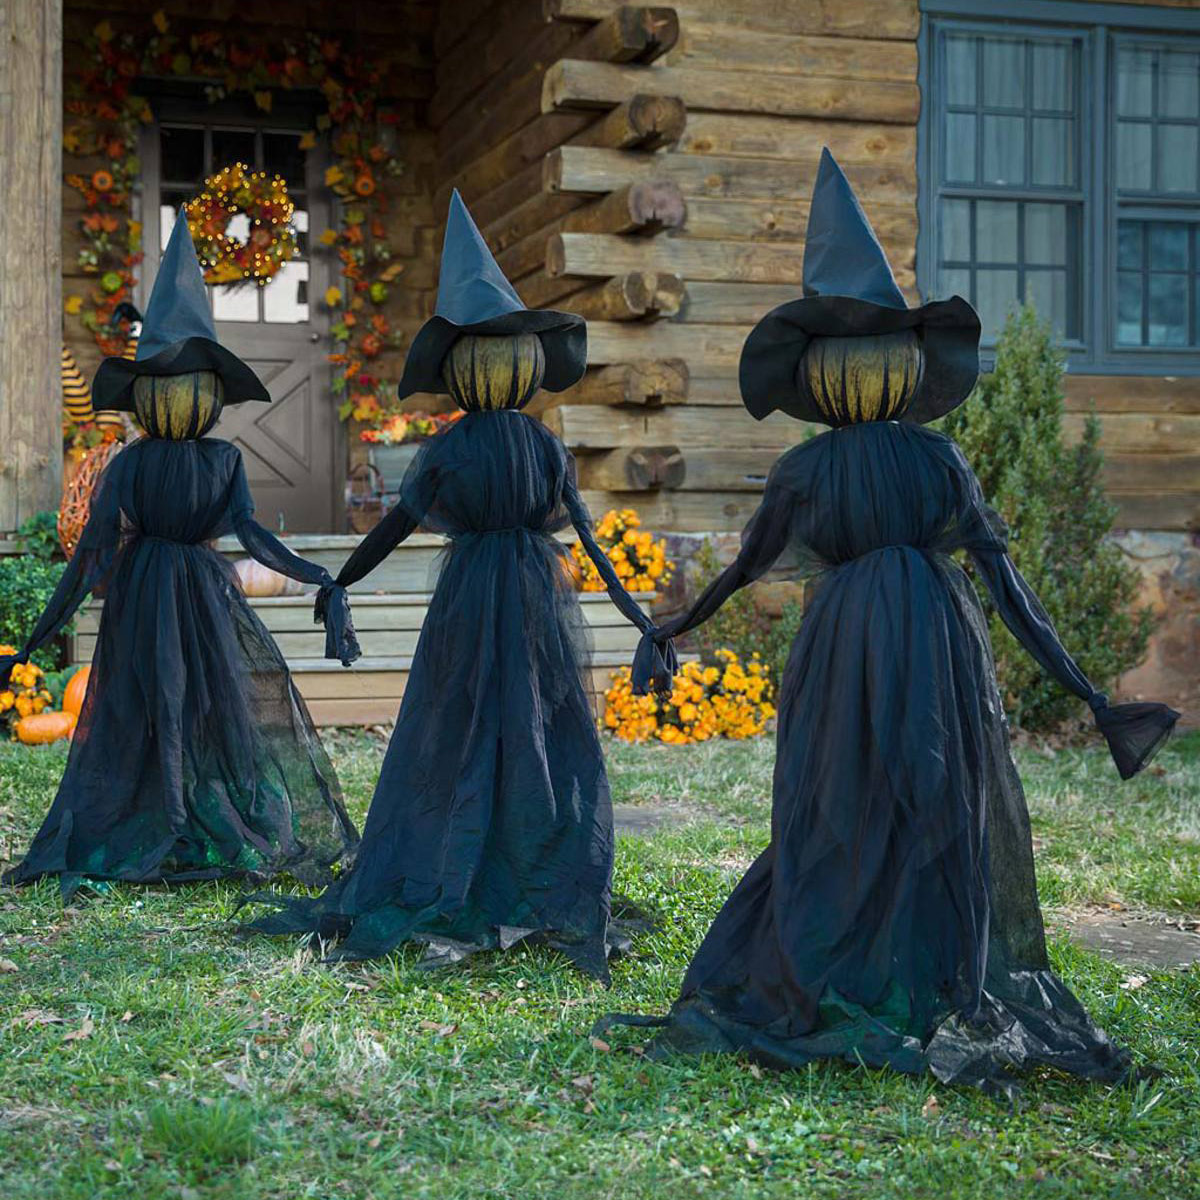 Creepy Illuminated Halloween Yard Witches